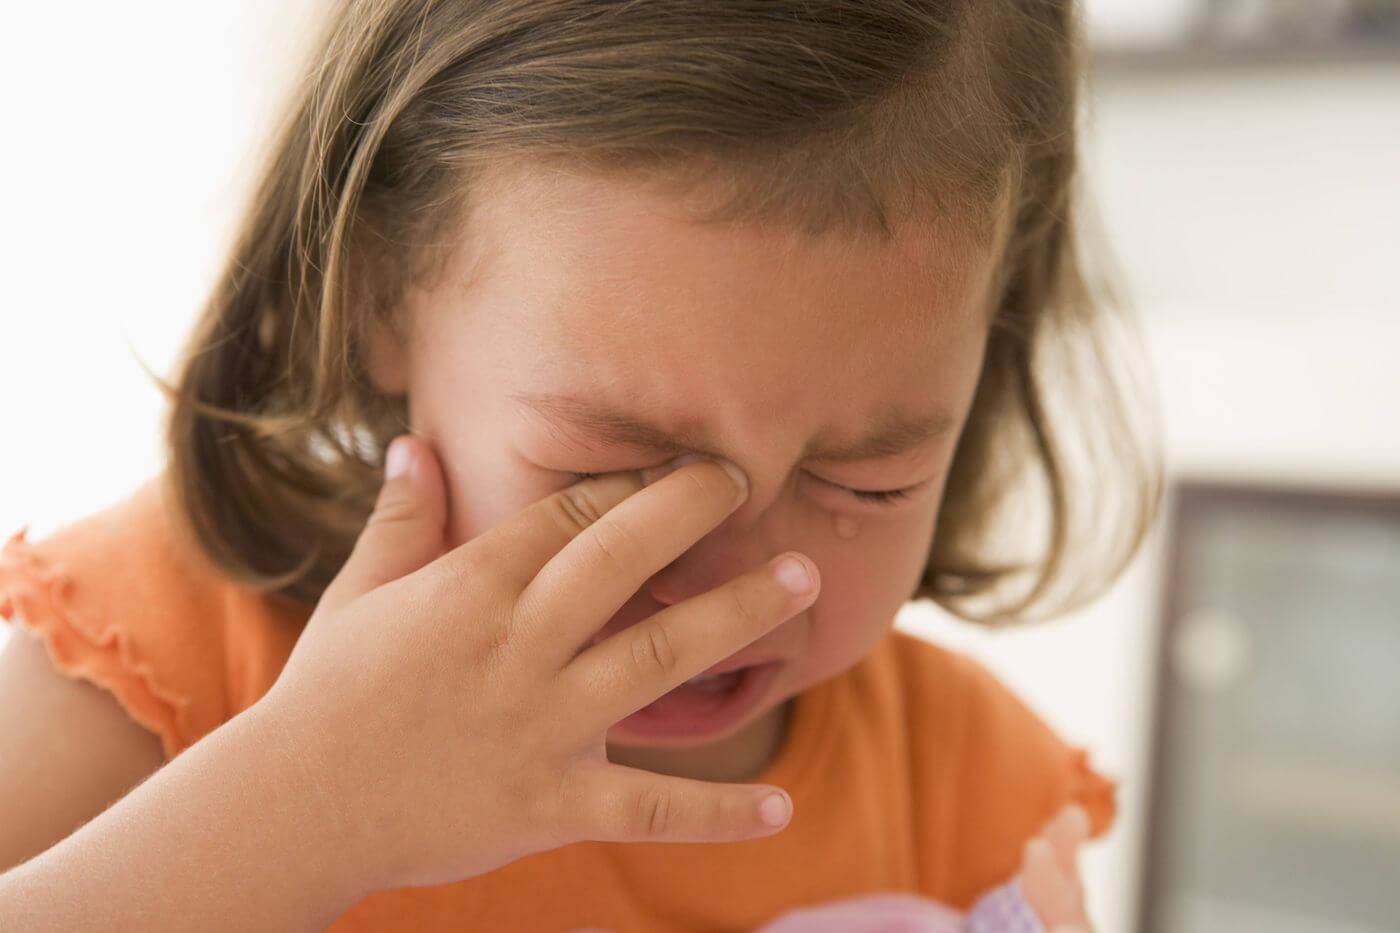 клипы онлайн малыш часто трет глазки орешки